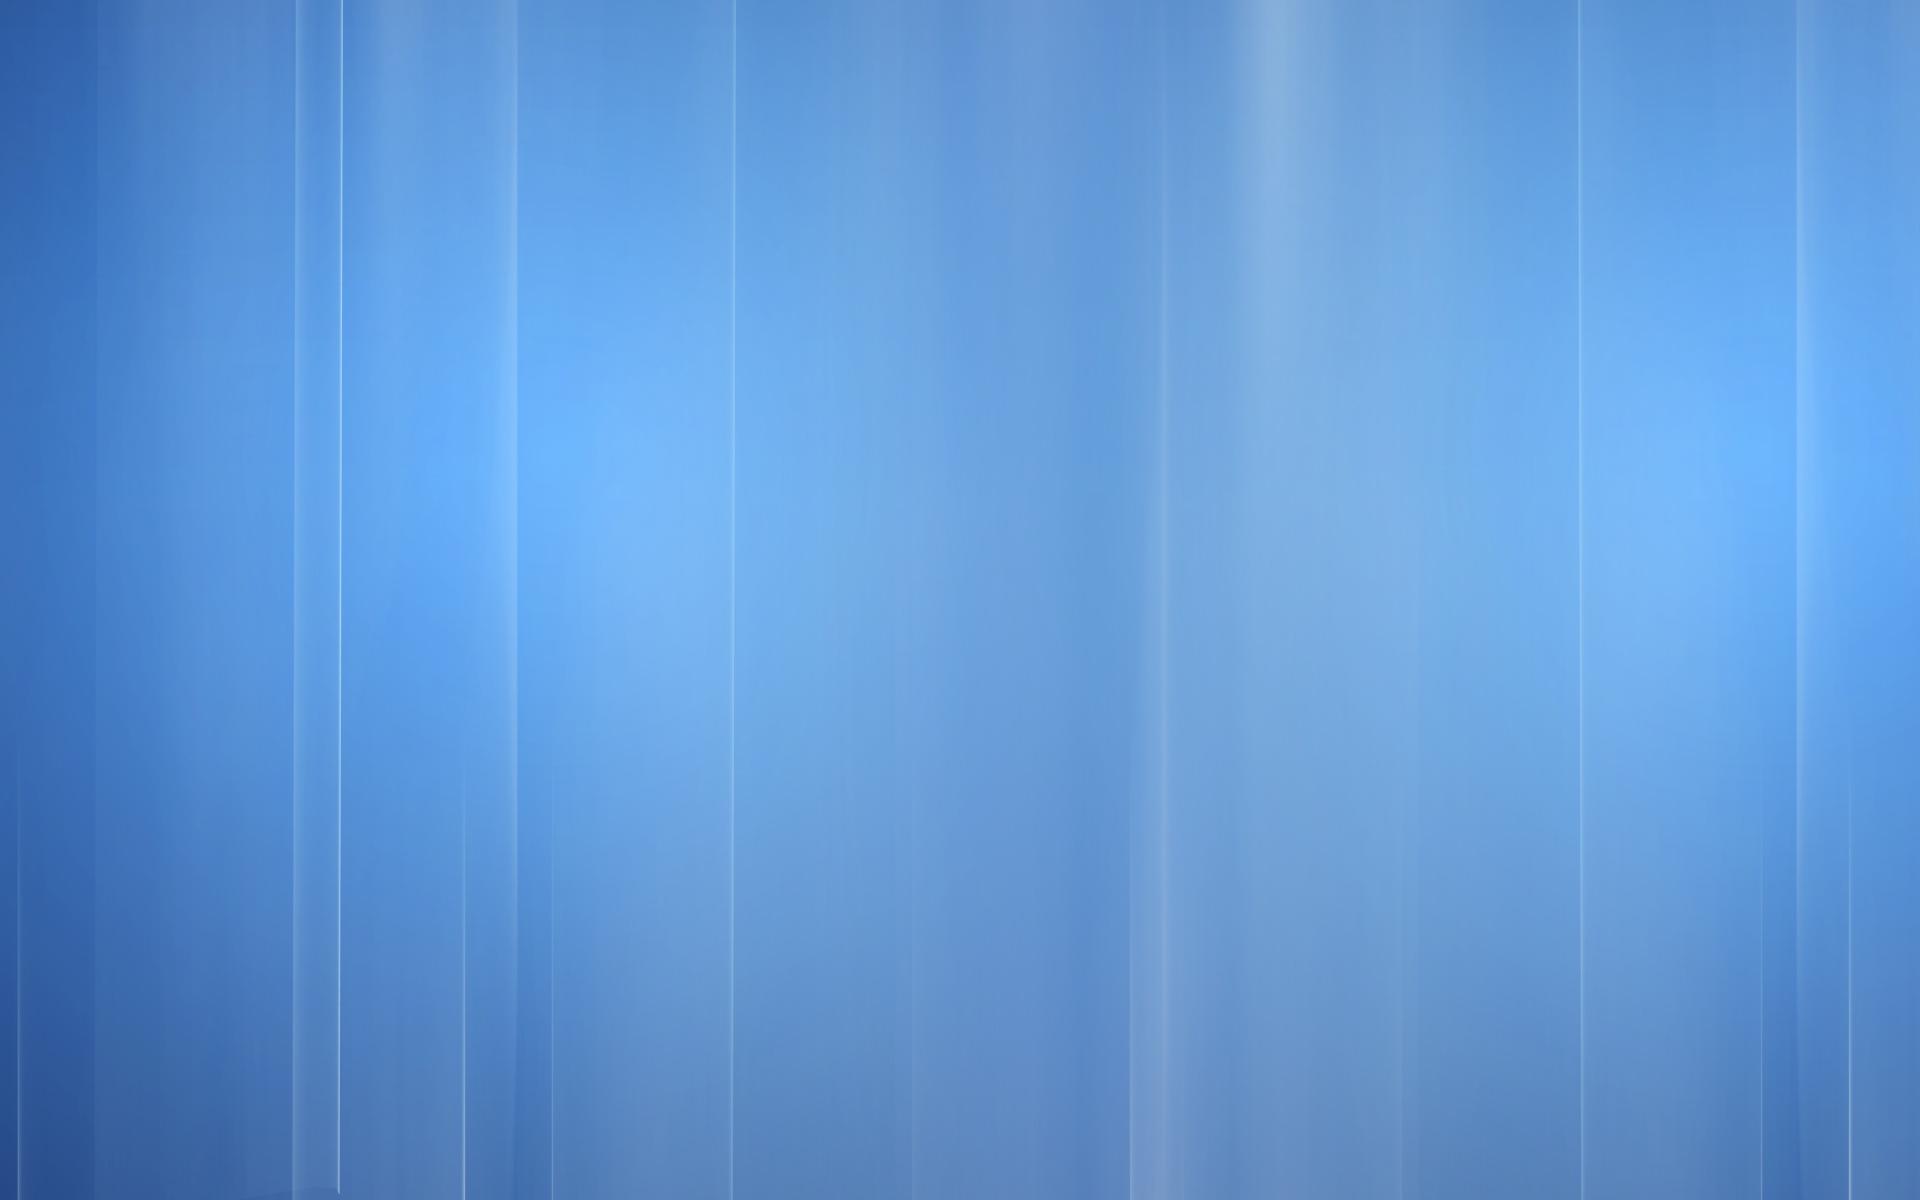 Plain blue wallpaper 37 Wallpapers Adorable Wallpapers 1920x1200